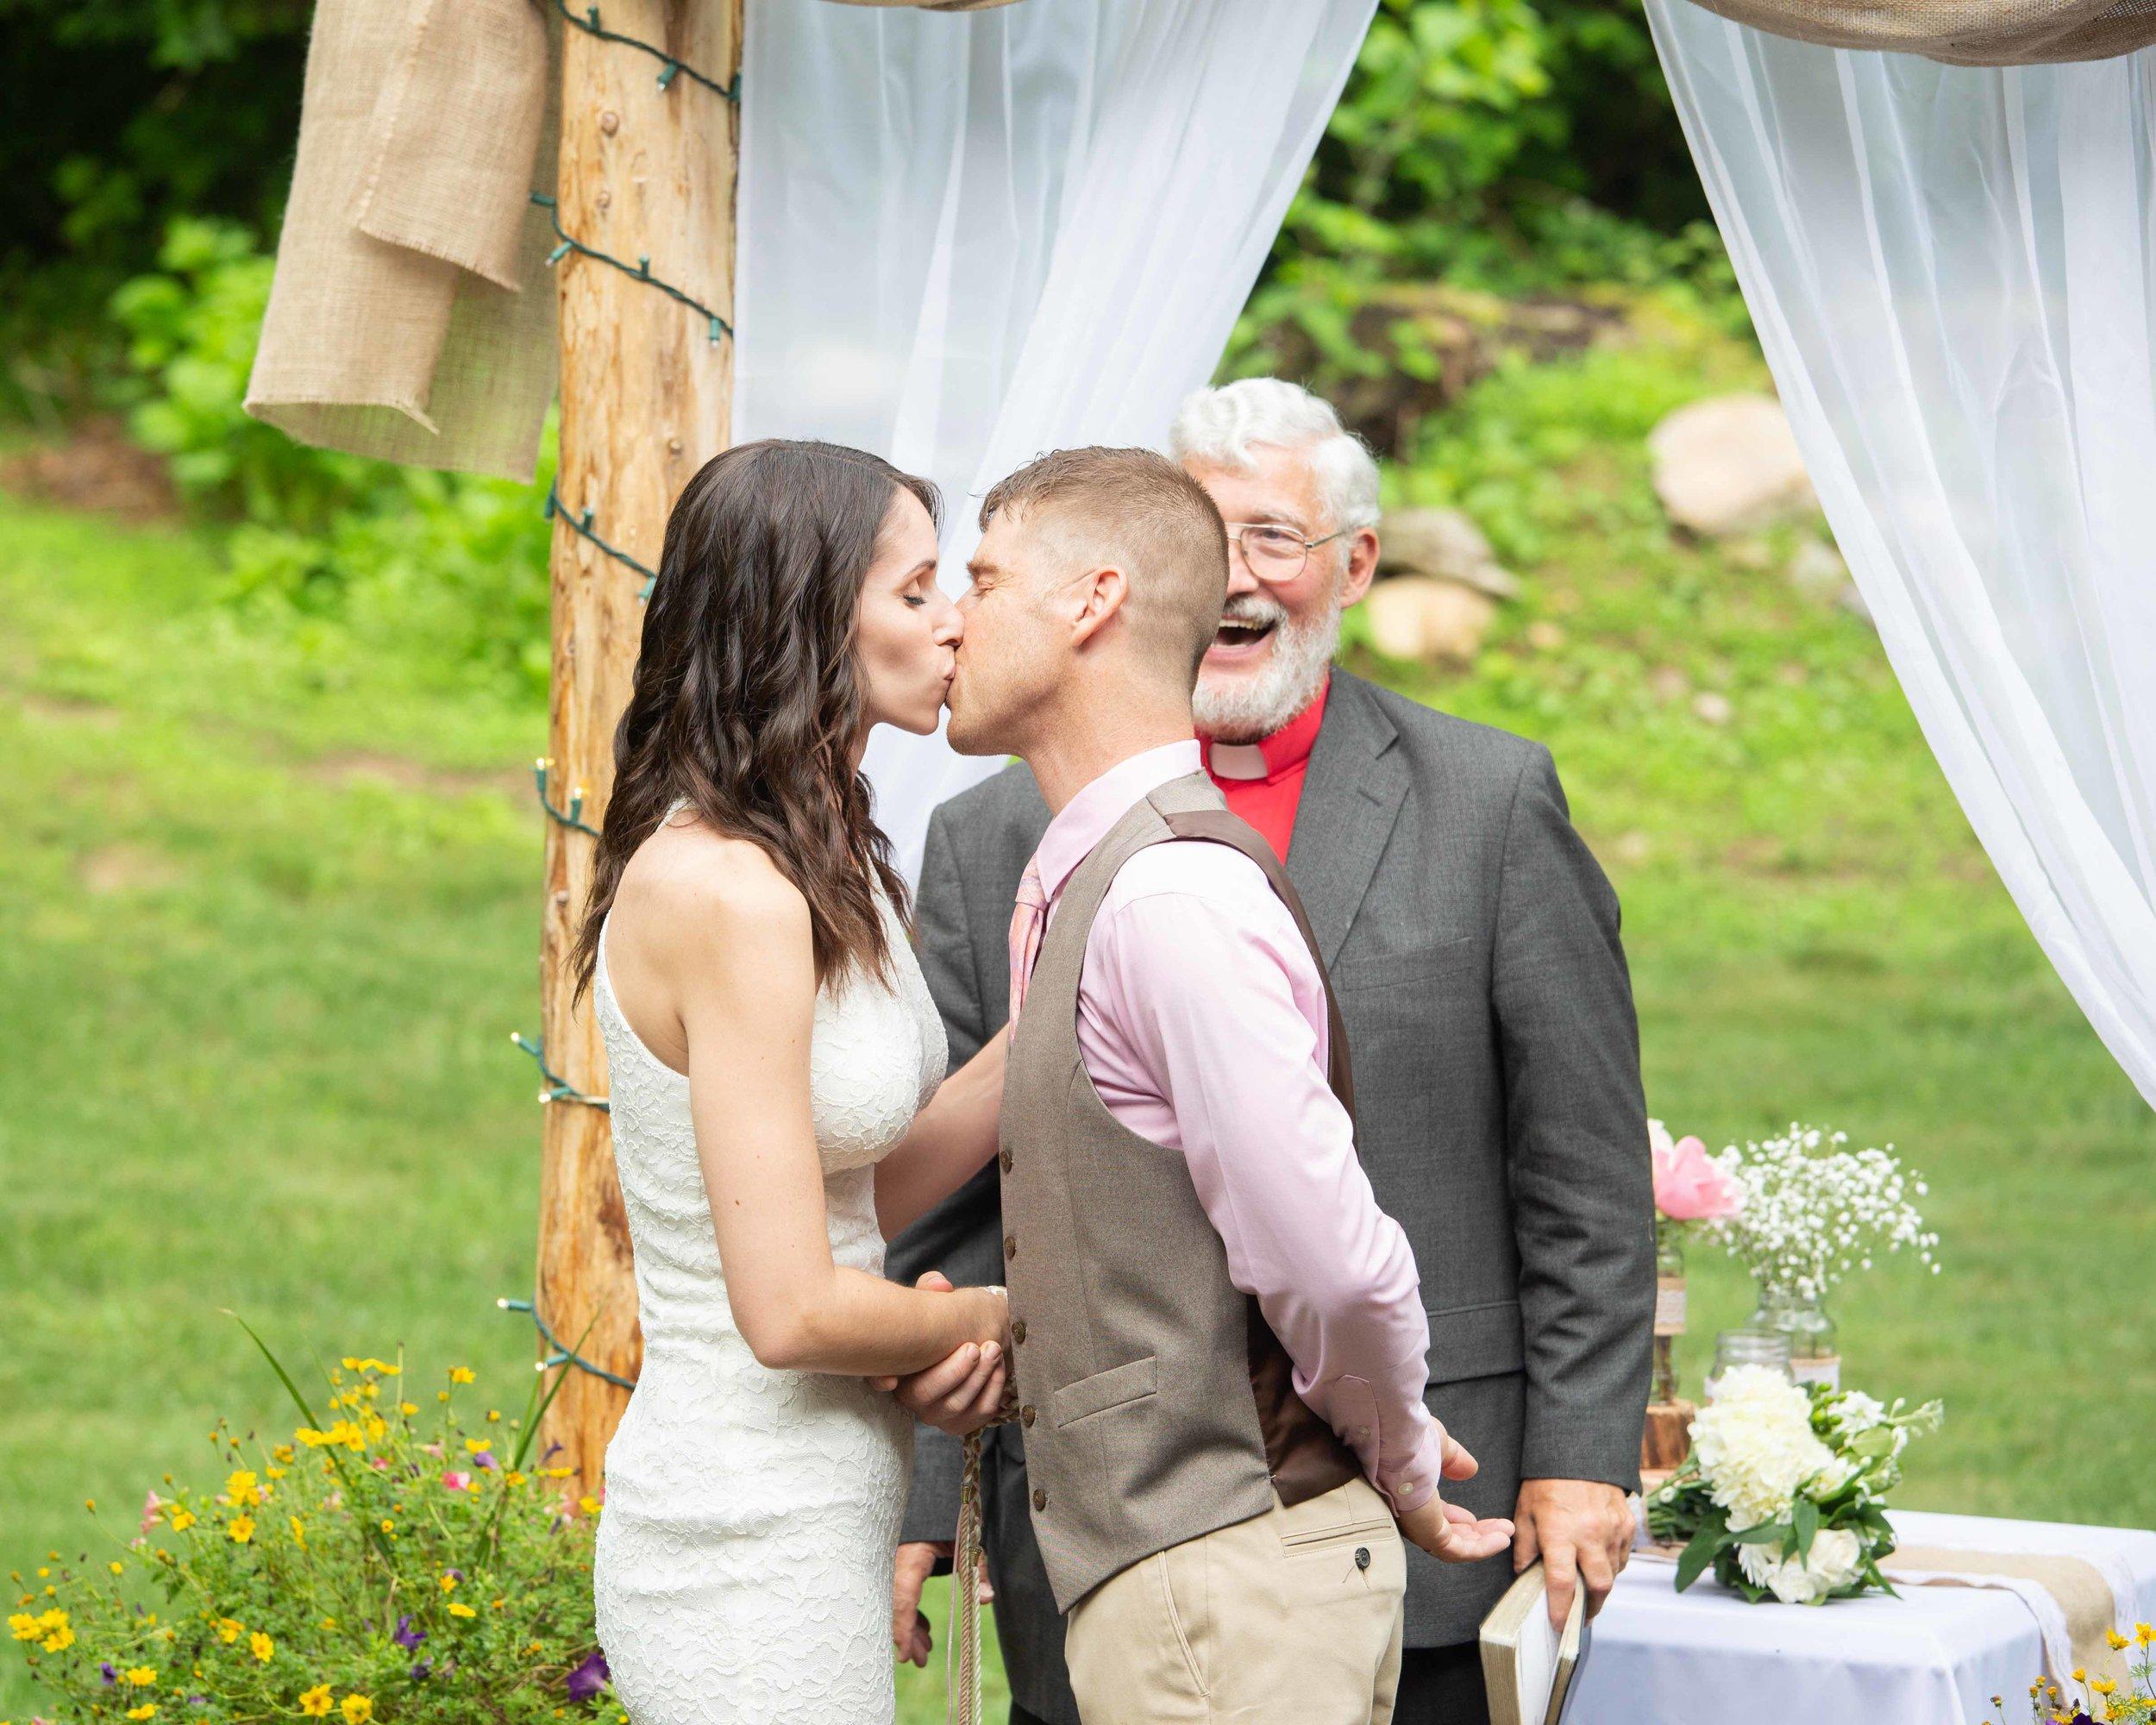 Vow Renewal, Wedding Photography-15.jpg